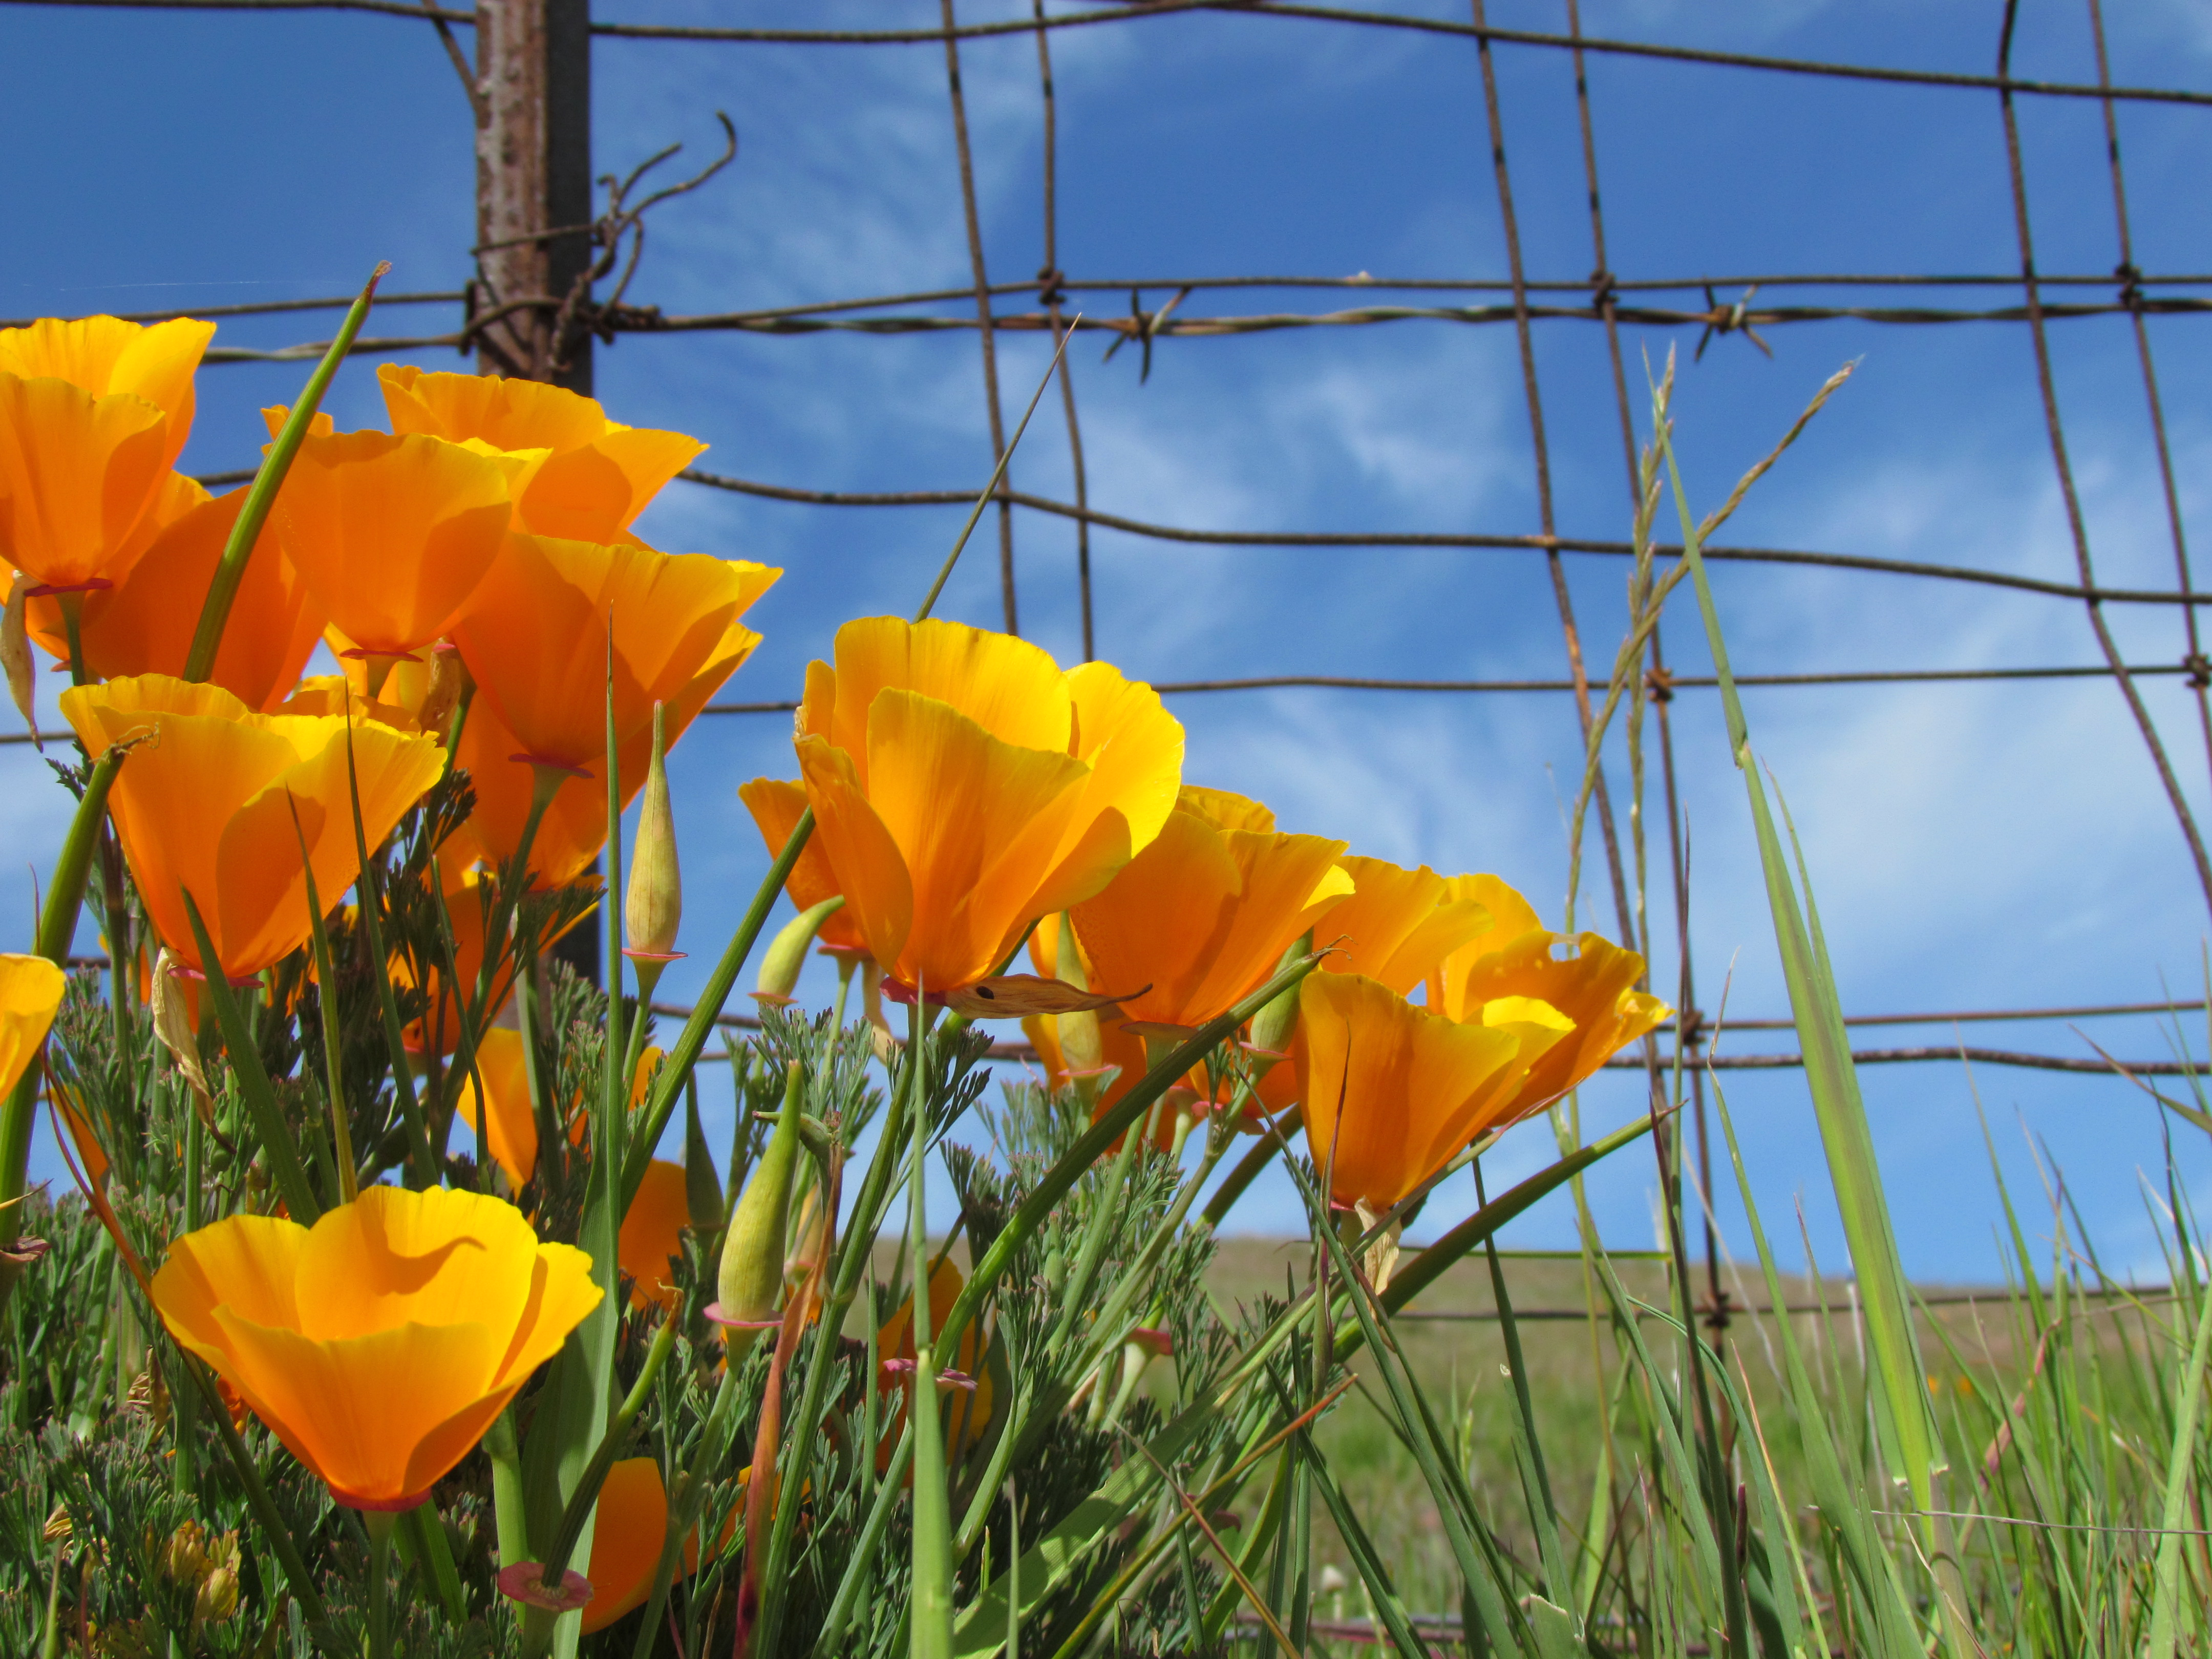 Sonoma Valley spring